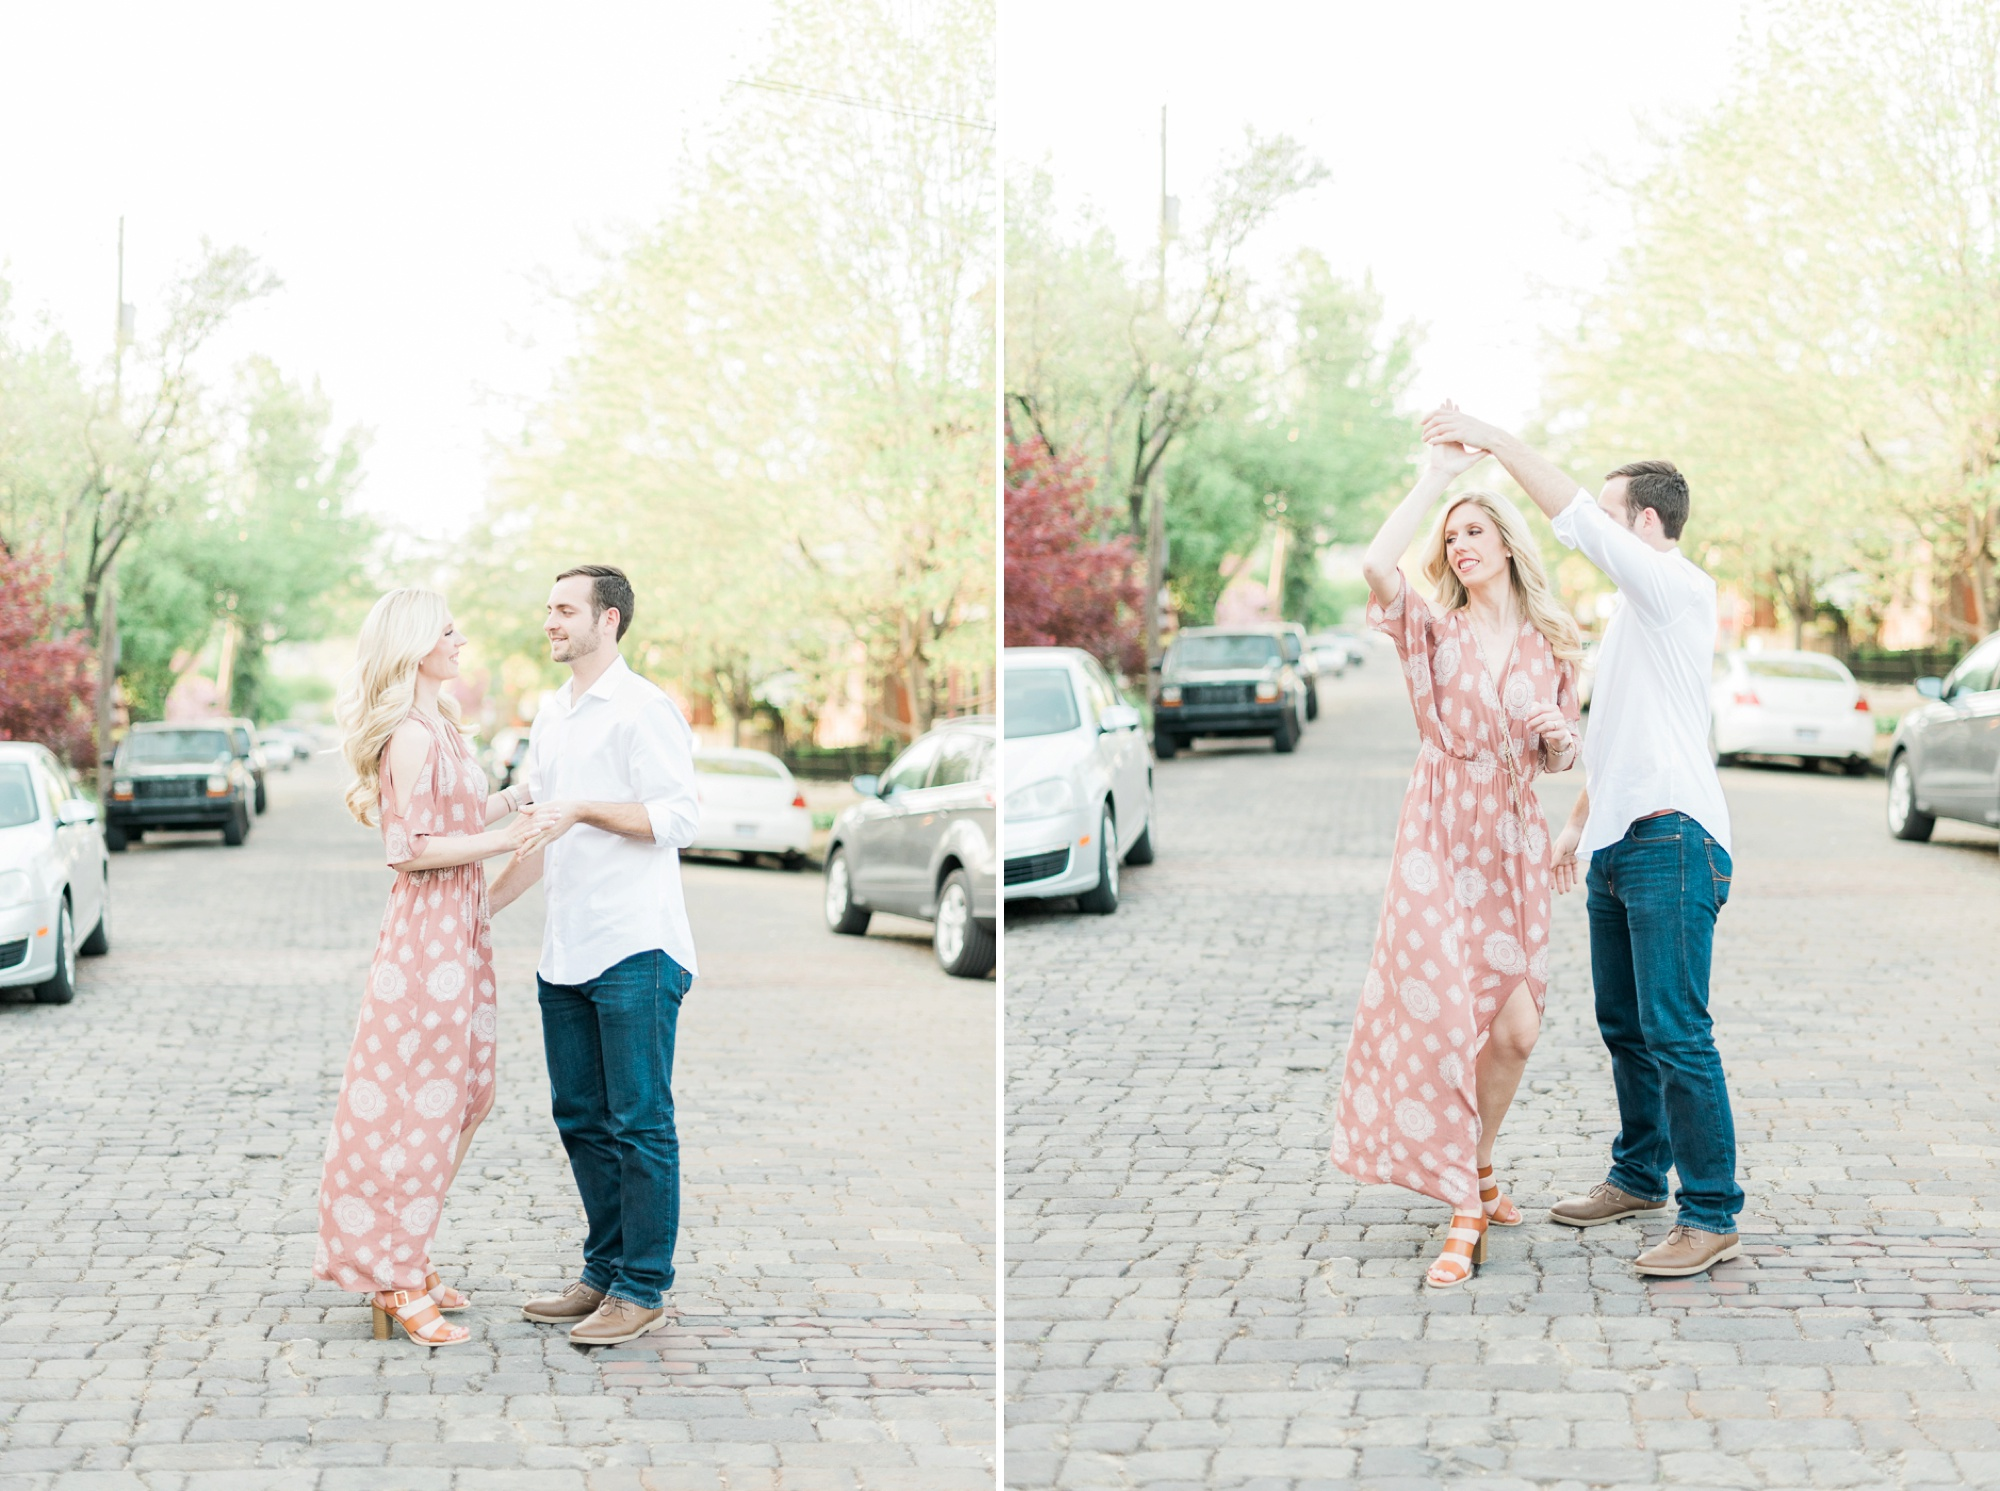 german-village-engagement-session-columbus-ohio-wedding-photographer-60.jpg